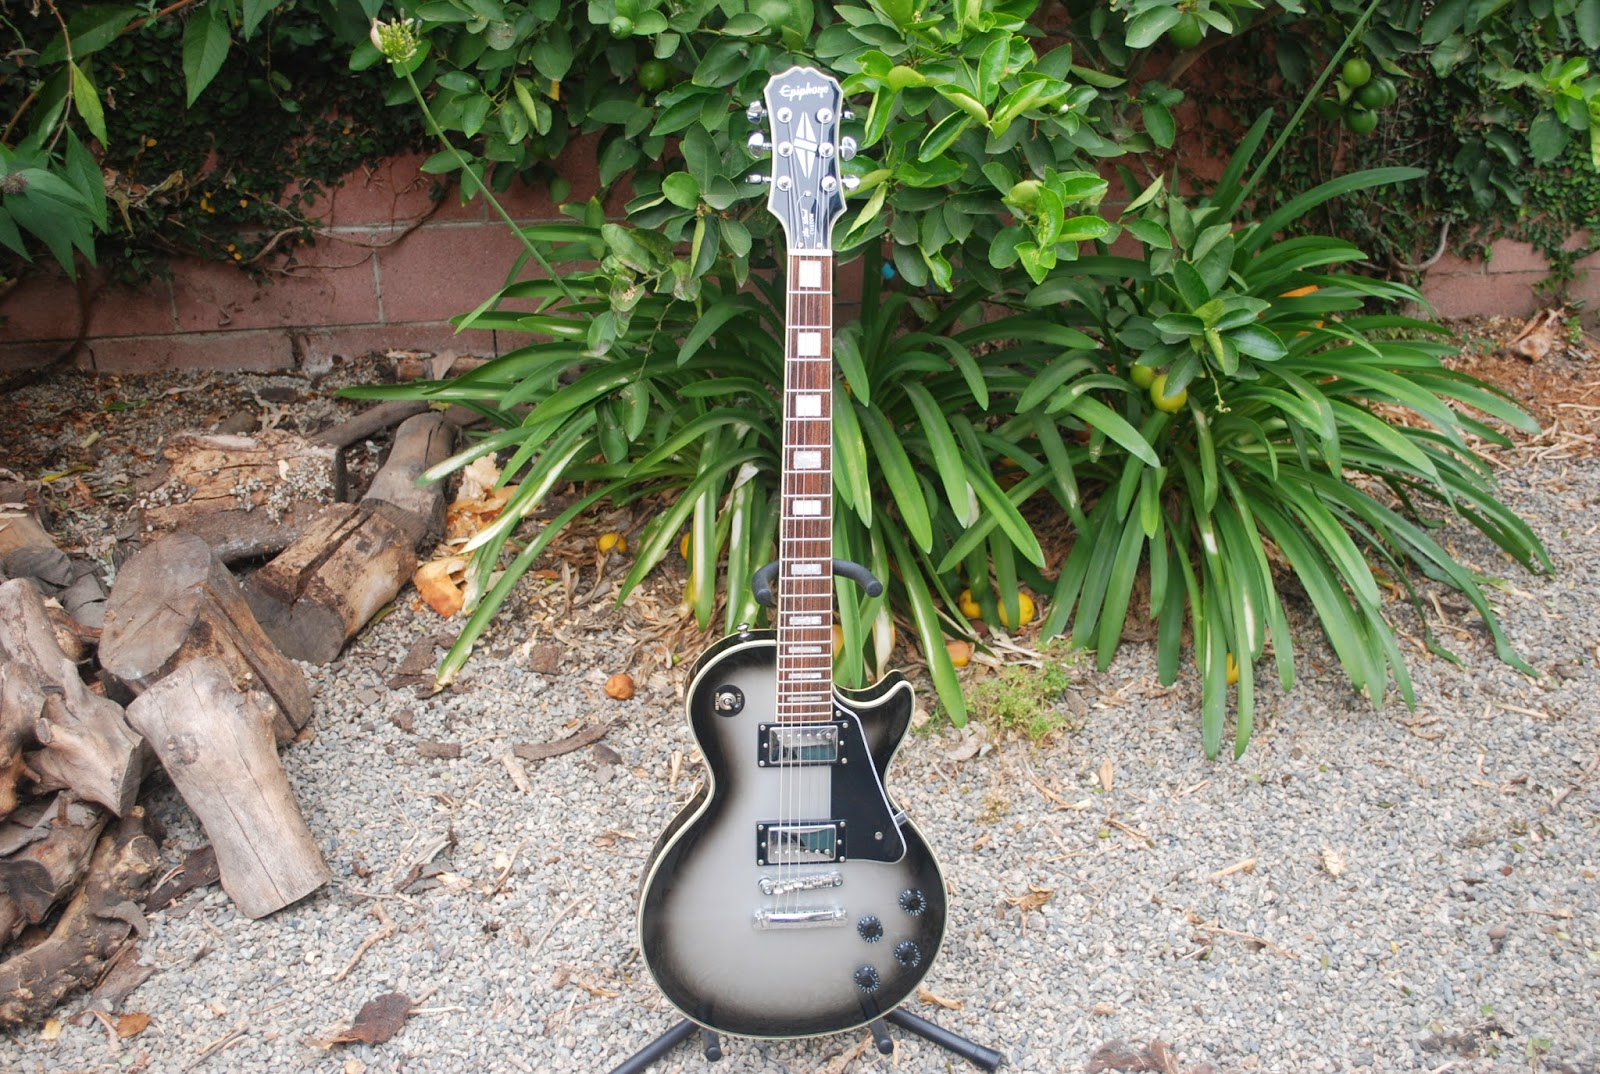 Rex and the Bass: 2008 Epiphone Les Paul Custom Silverburst